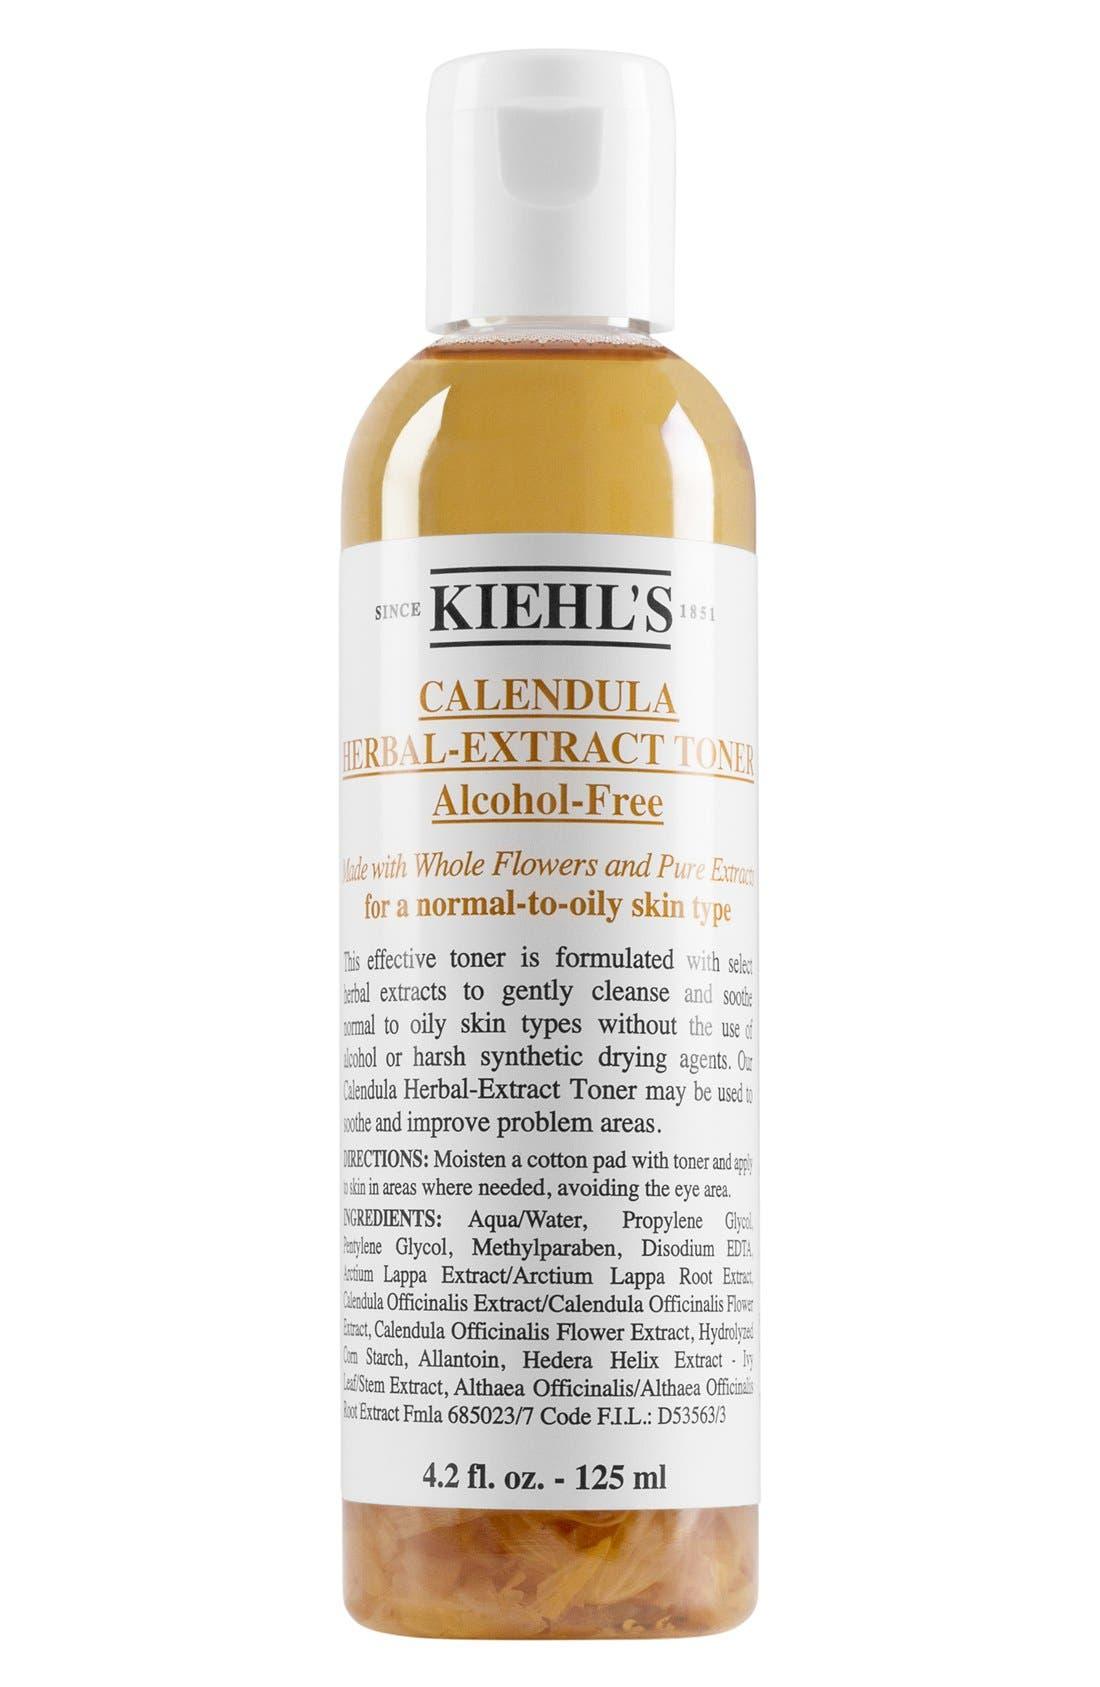 Kiehl's Since 1851 Calendula Herbal-Extract Alcohol-Free Toner